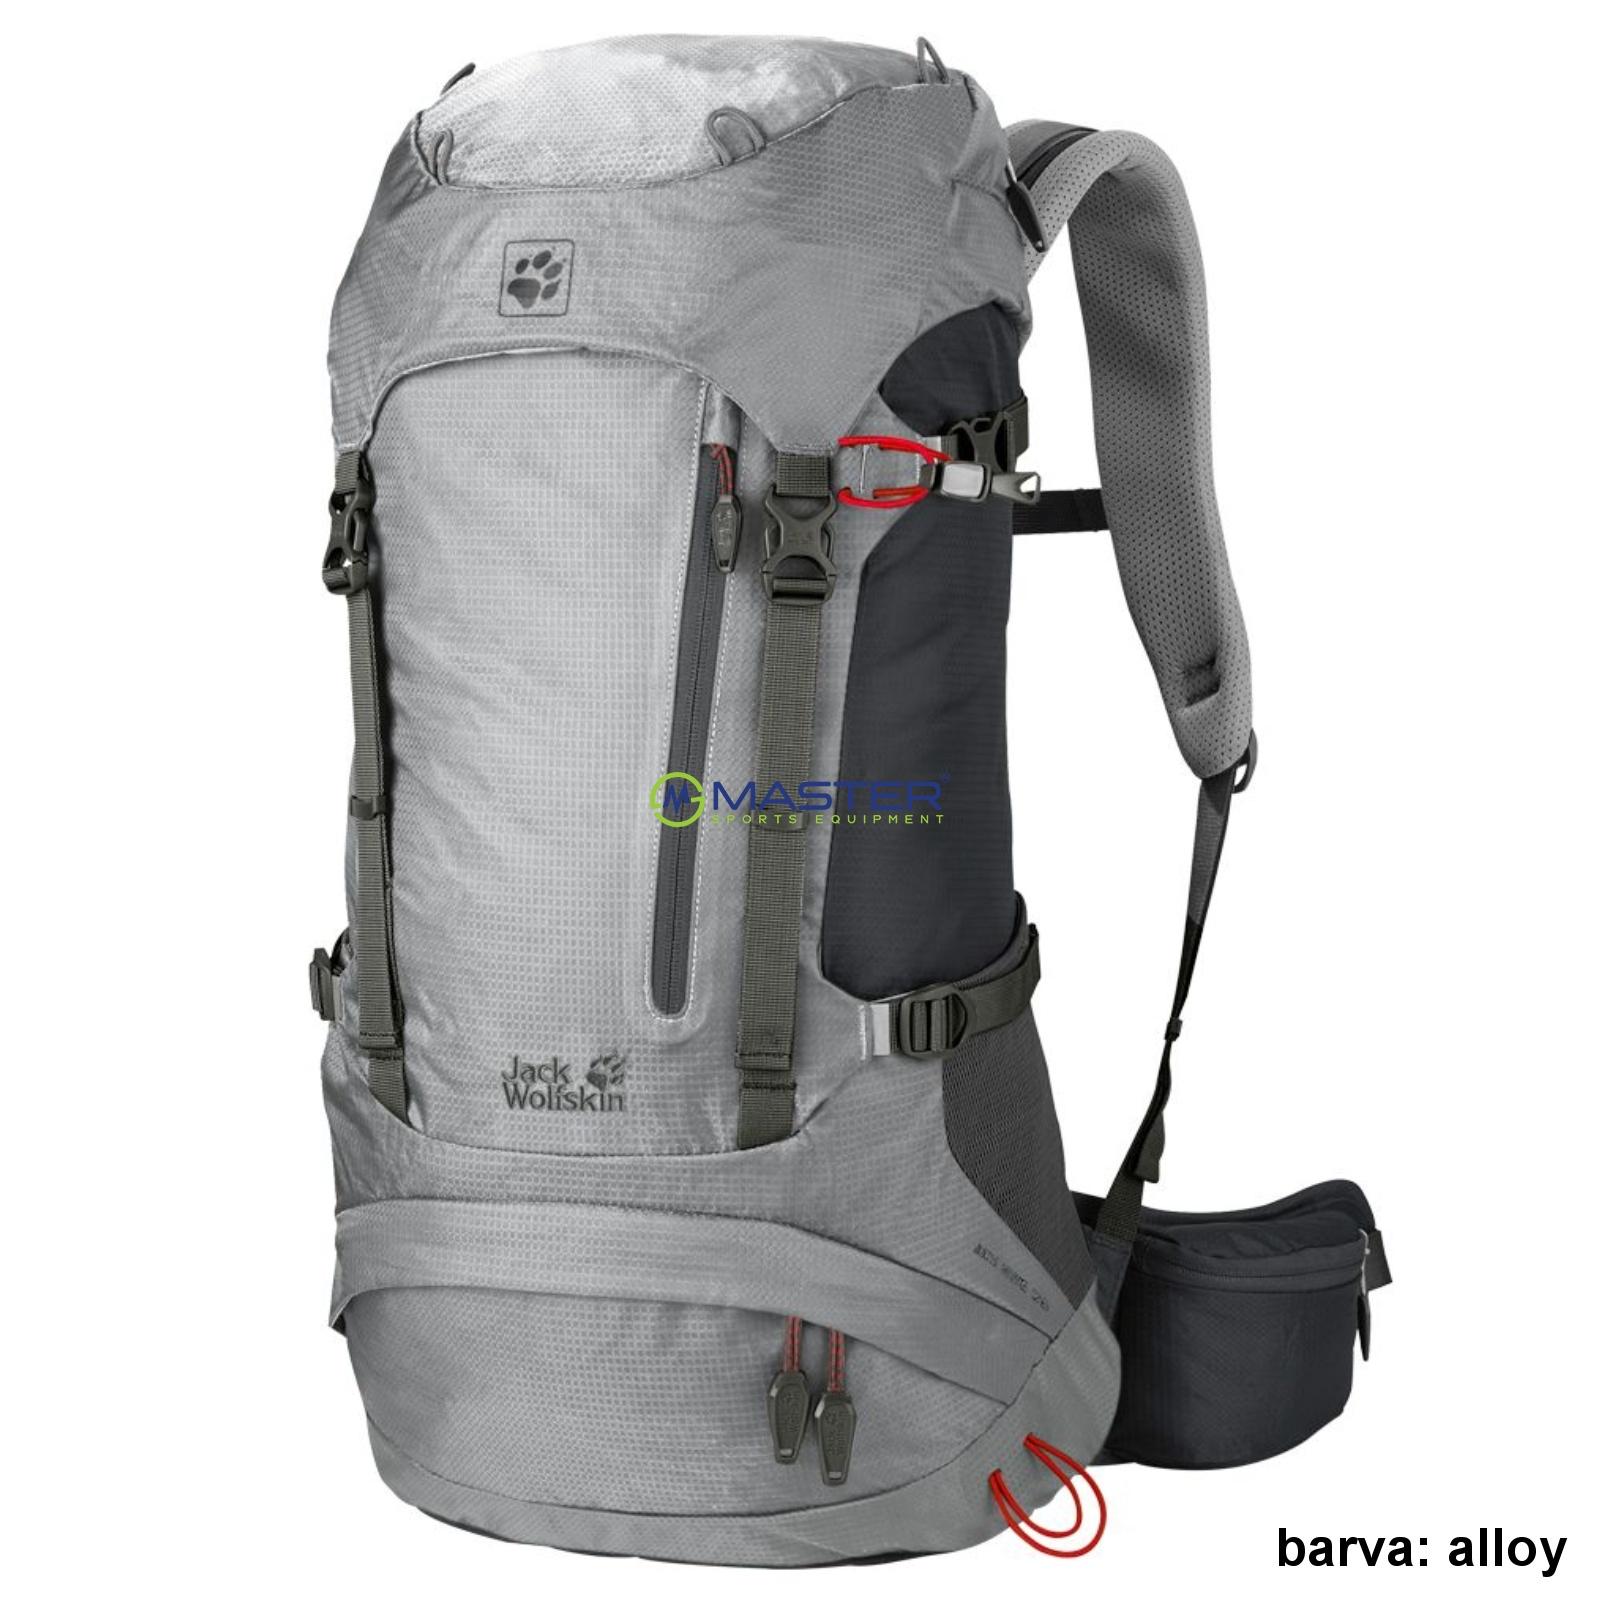 1e60dcd9e8 Batoh JACK WOLFSKIN ACS Hike Pack 26 l